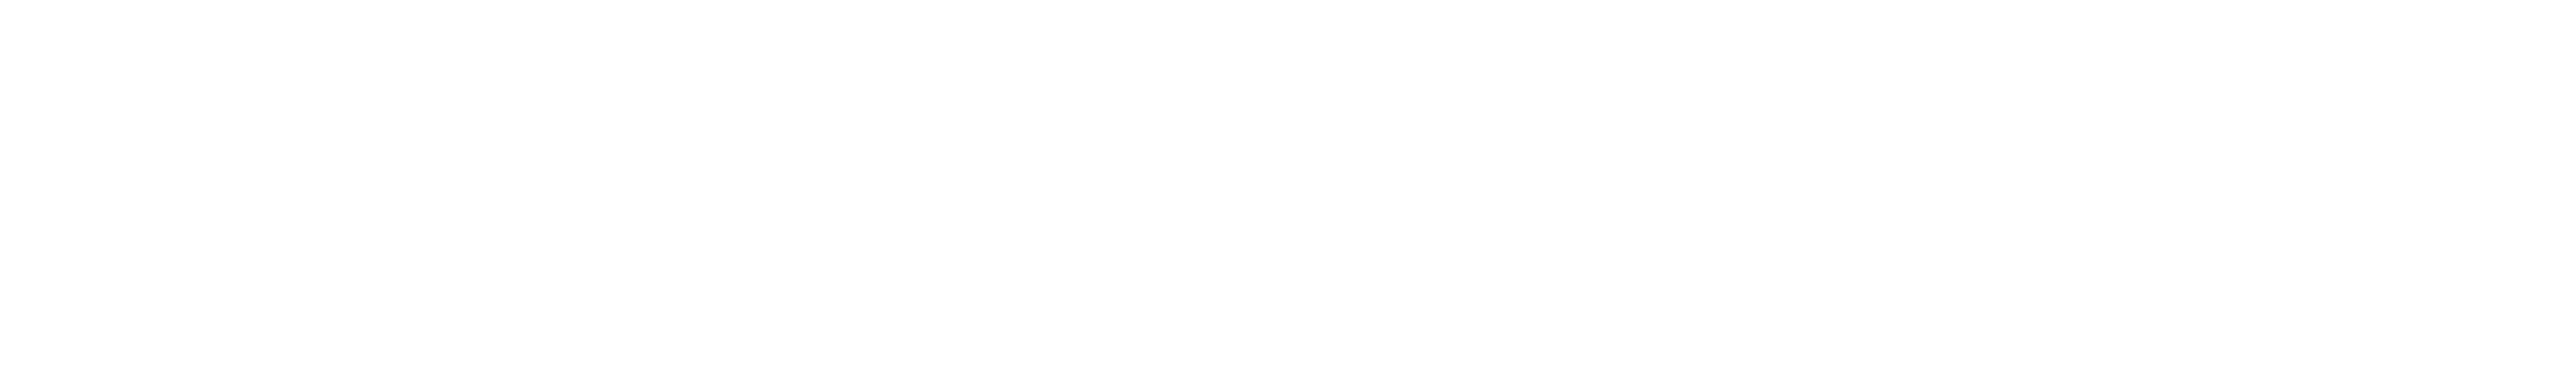 Hulu PM Pediatrics